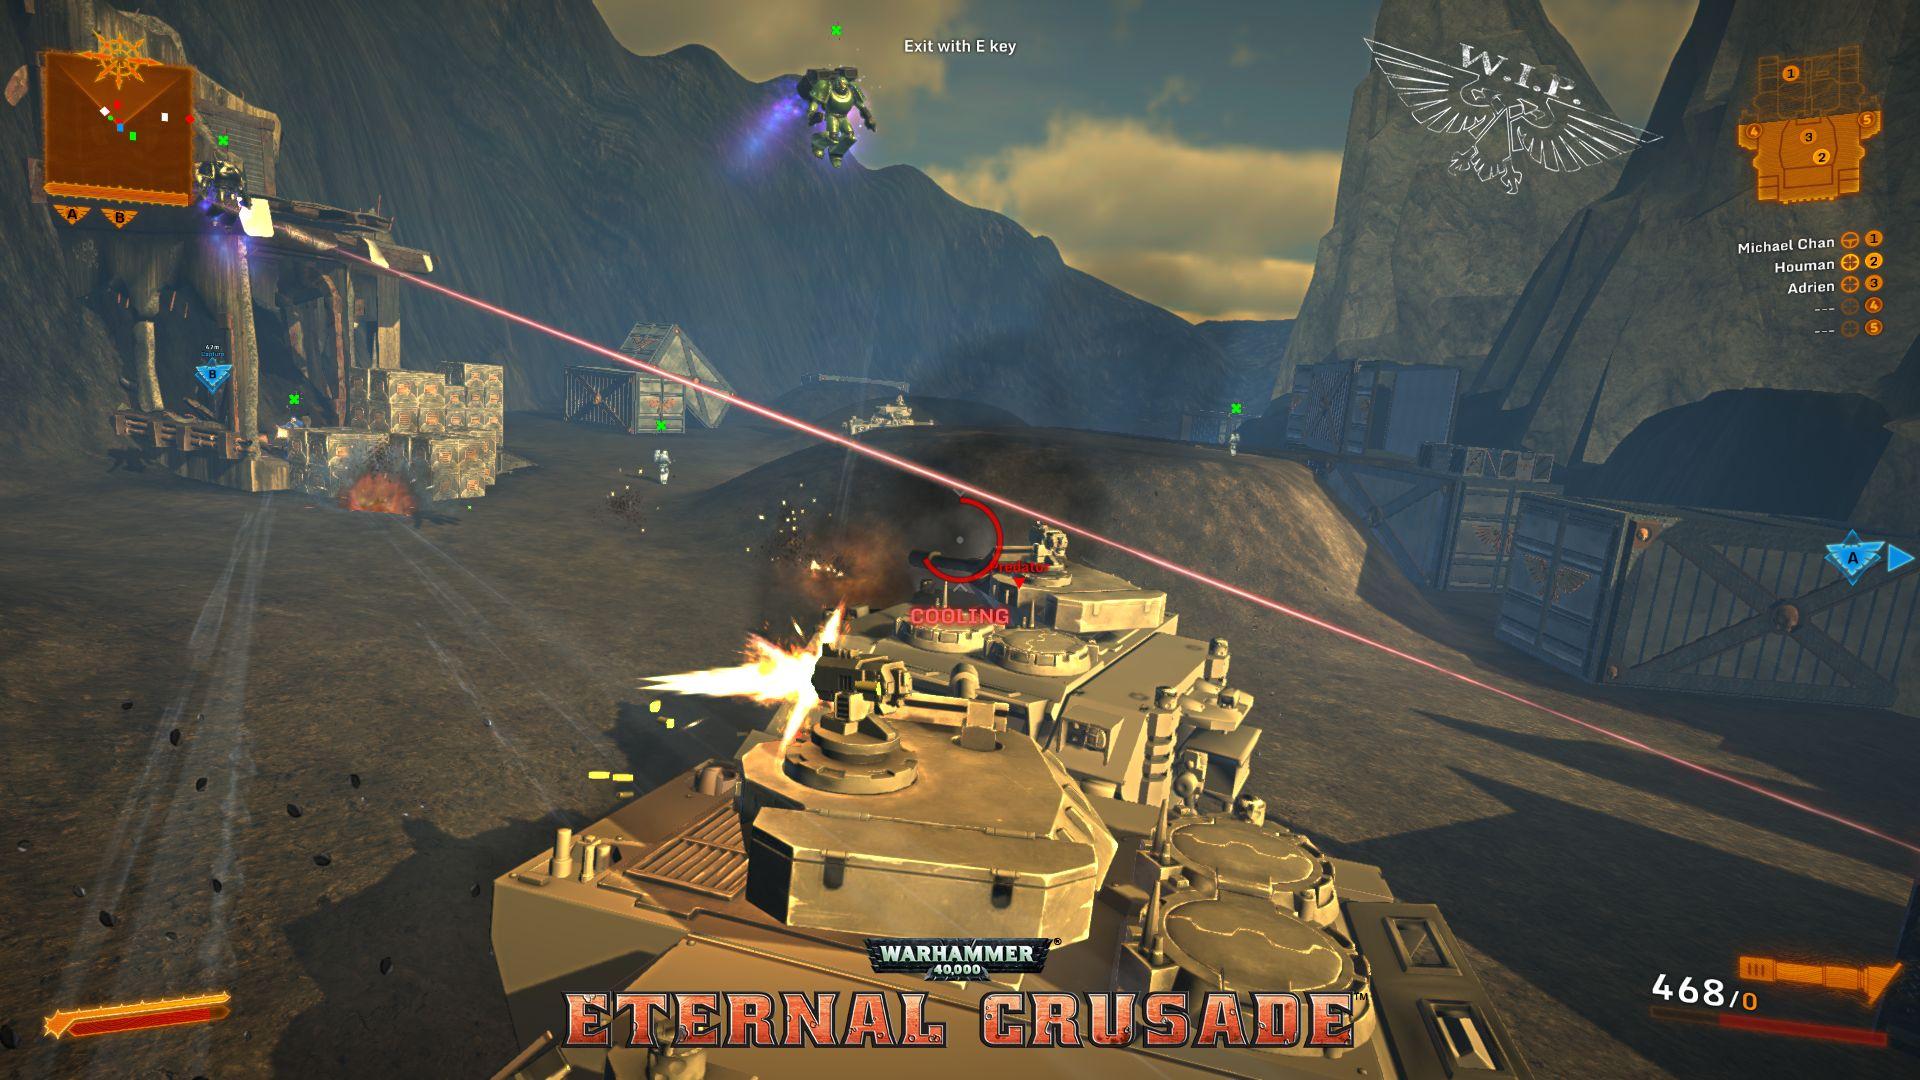 [Gc2014] warhammer 40k: eternal crusade - rvr никогда не наскучит! интервью goha.ru